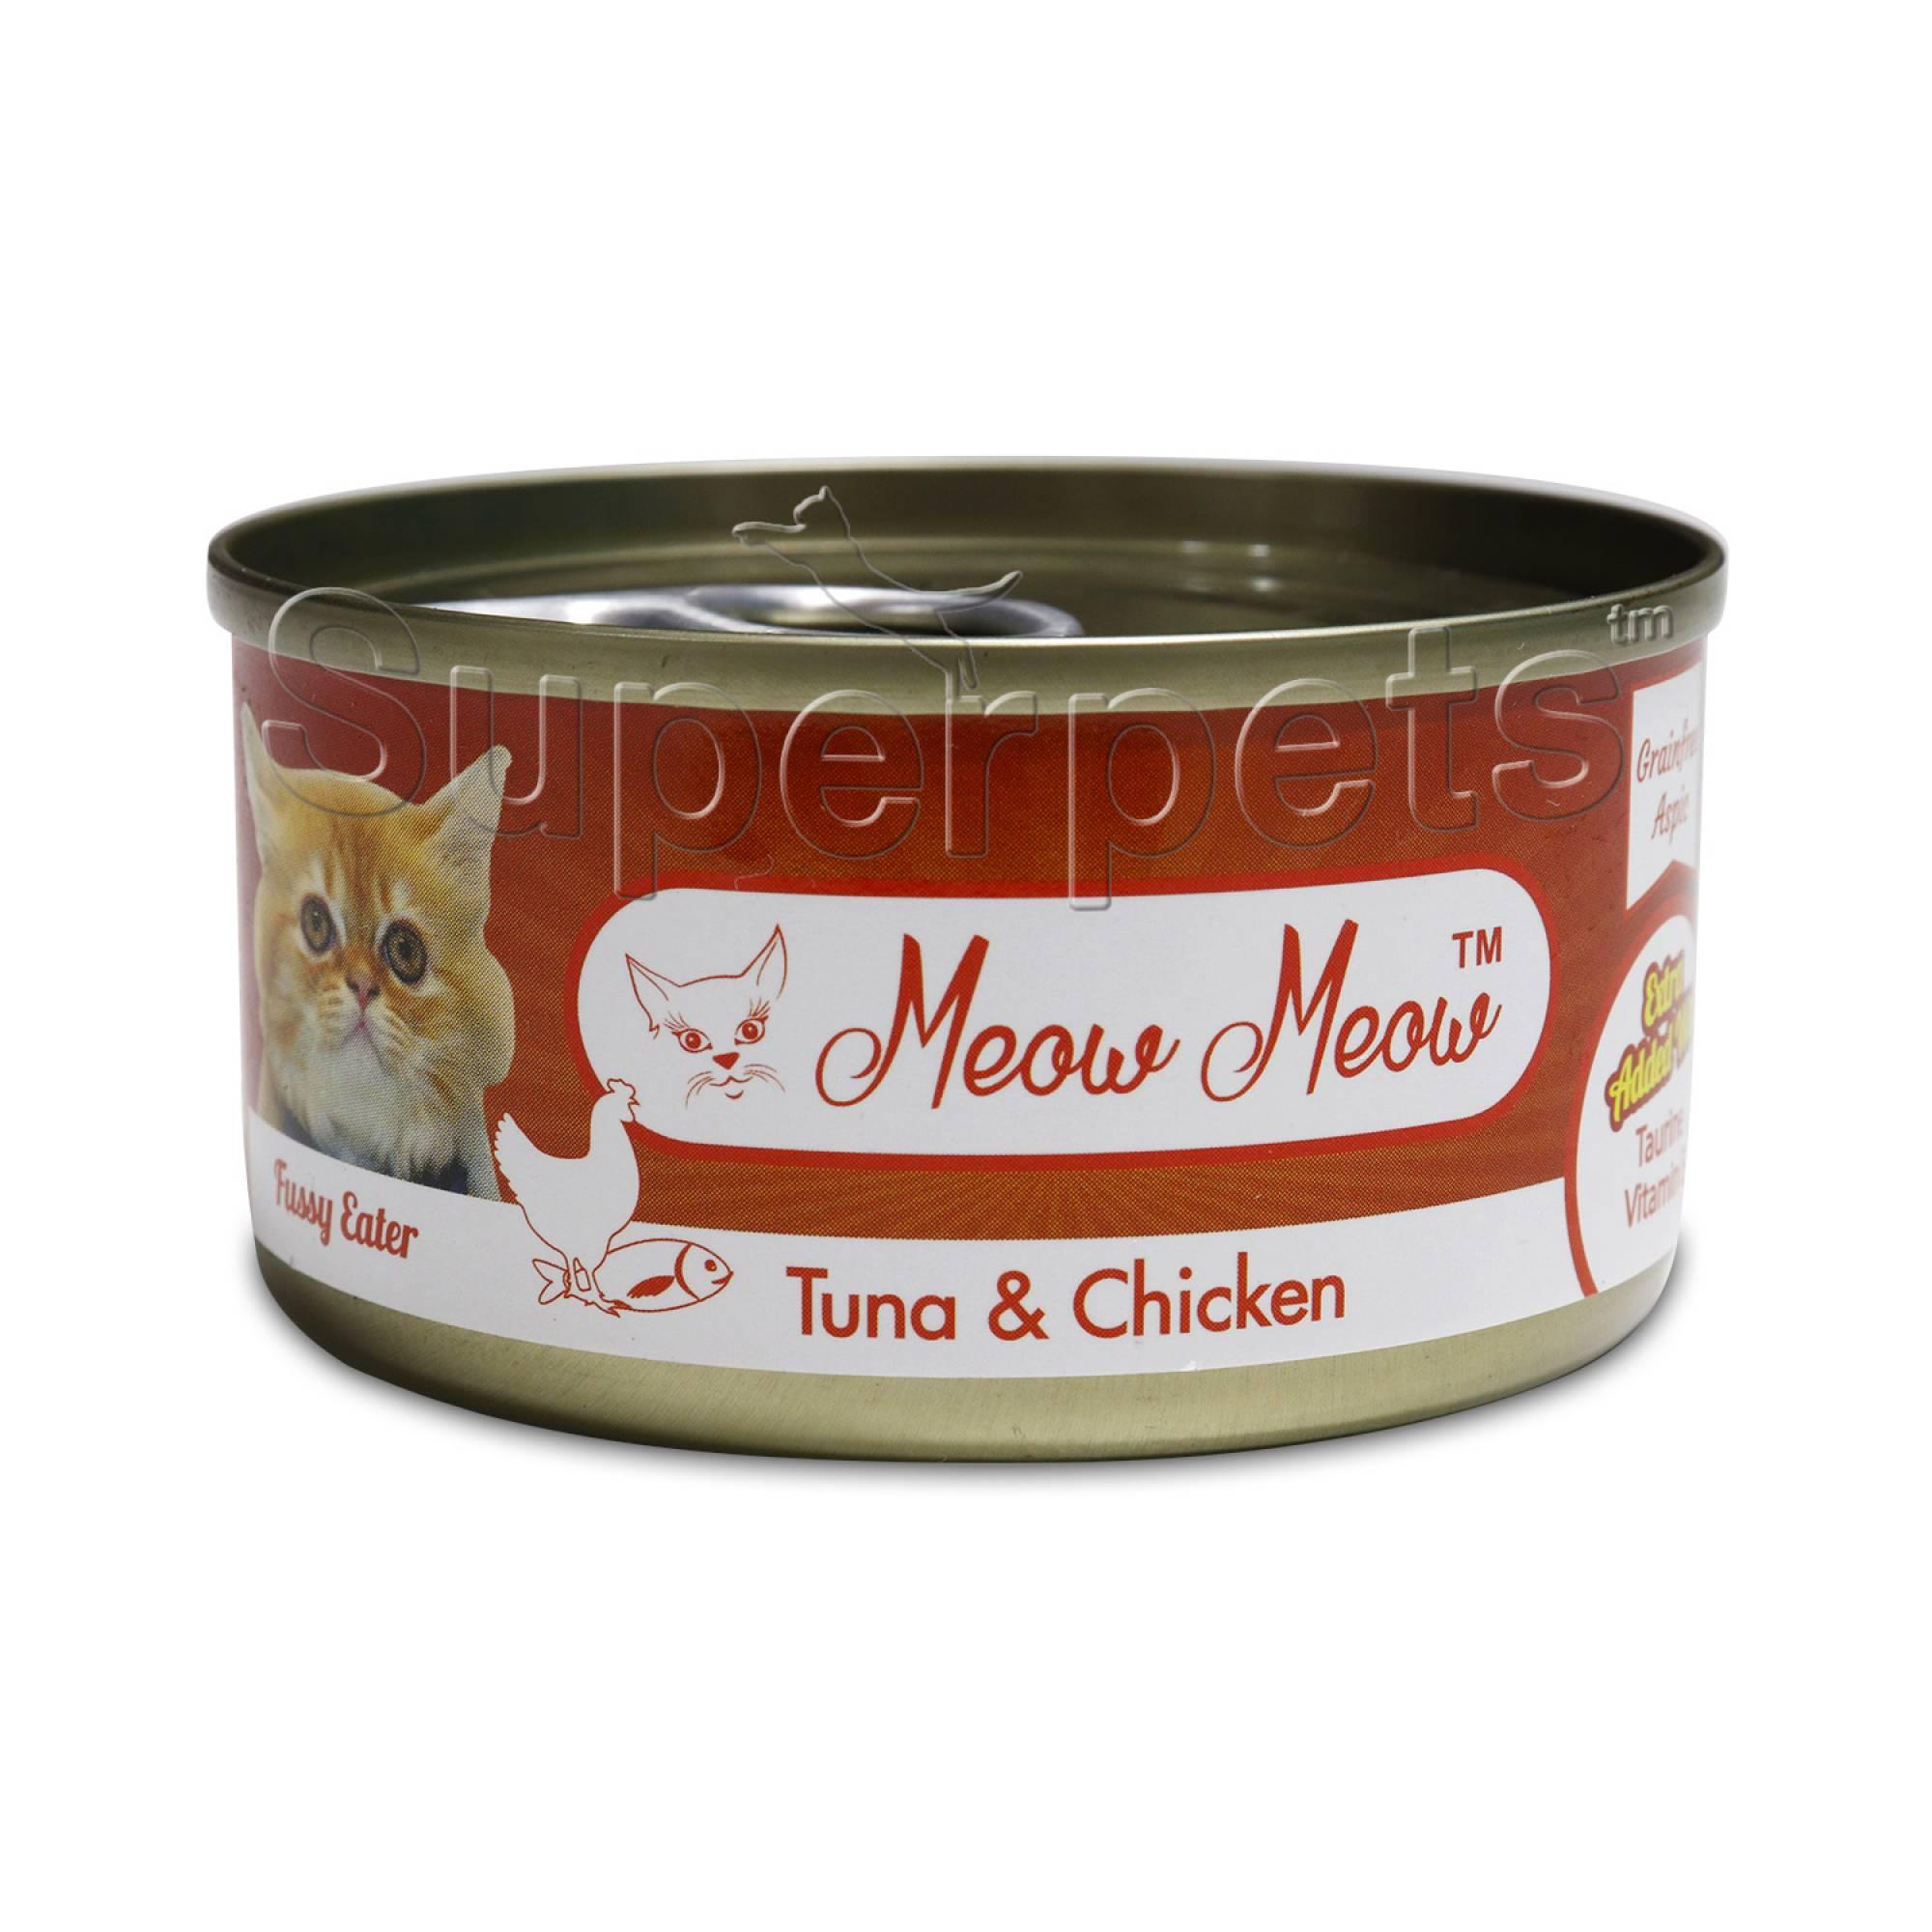 Meow Meow - Tuna & Chicken - Grain Free 80g x 24pcs (1 carton)